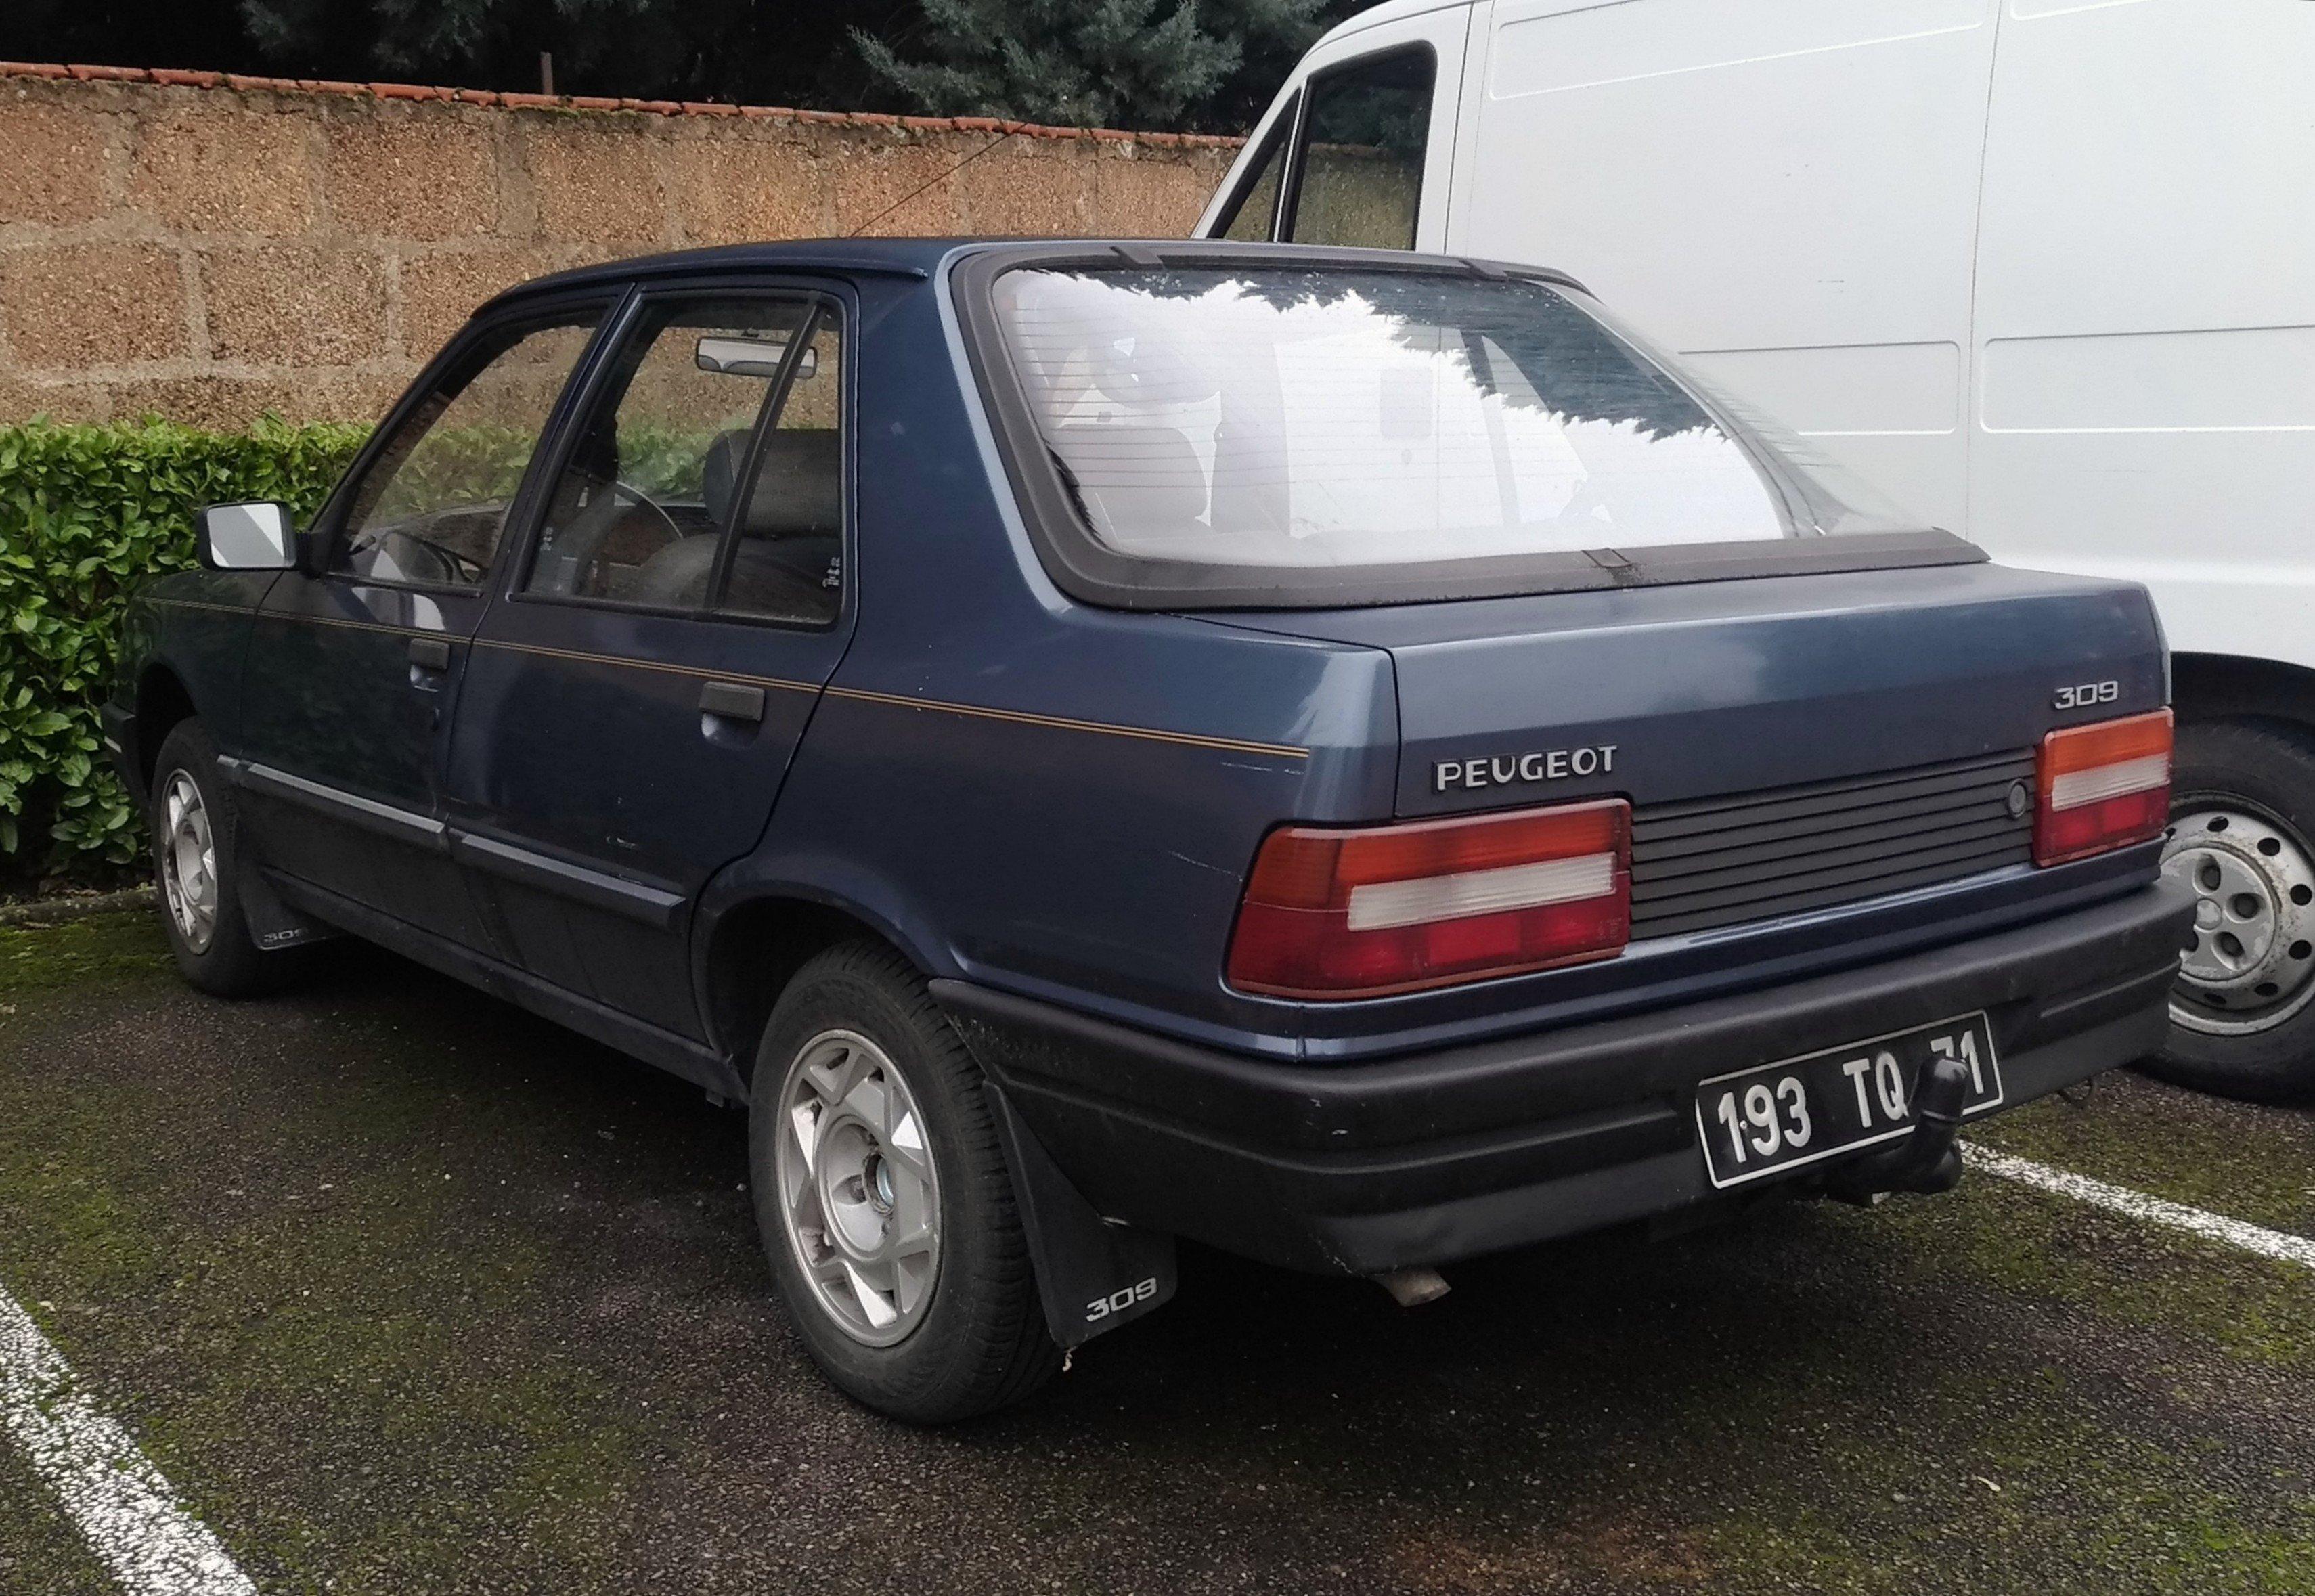 File Peugeot 309 39849680233 Jpg Wikimedia Commons